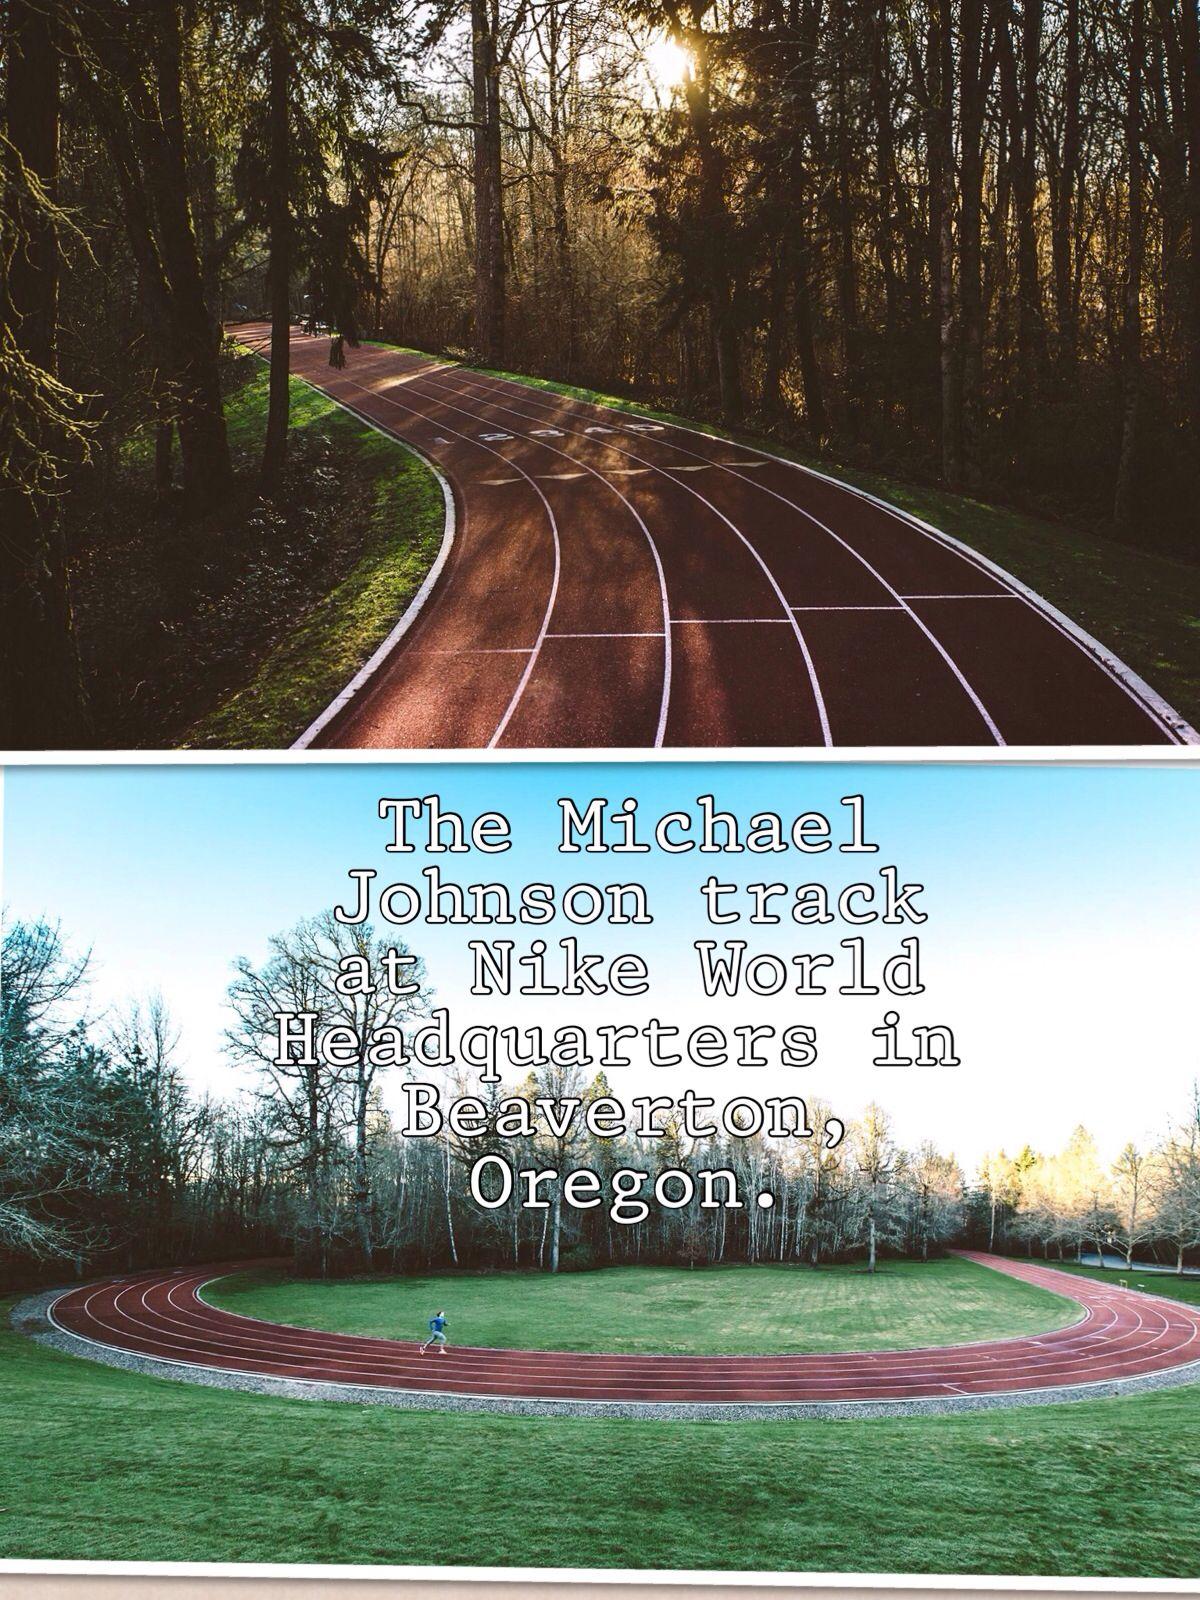 the michael johnson track nike world hq beaverton oregon want the michael johnson track nike world hq beaverton oregon want to here